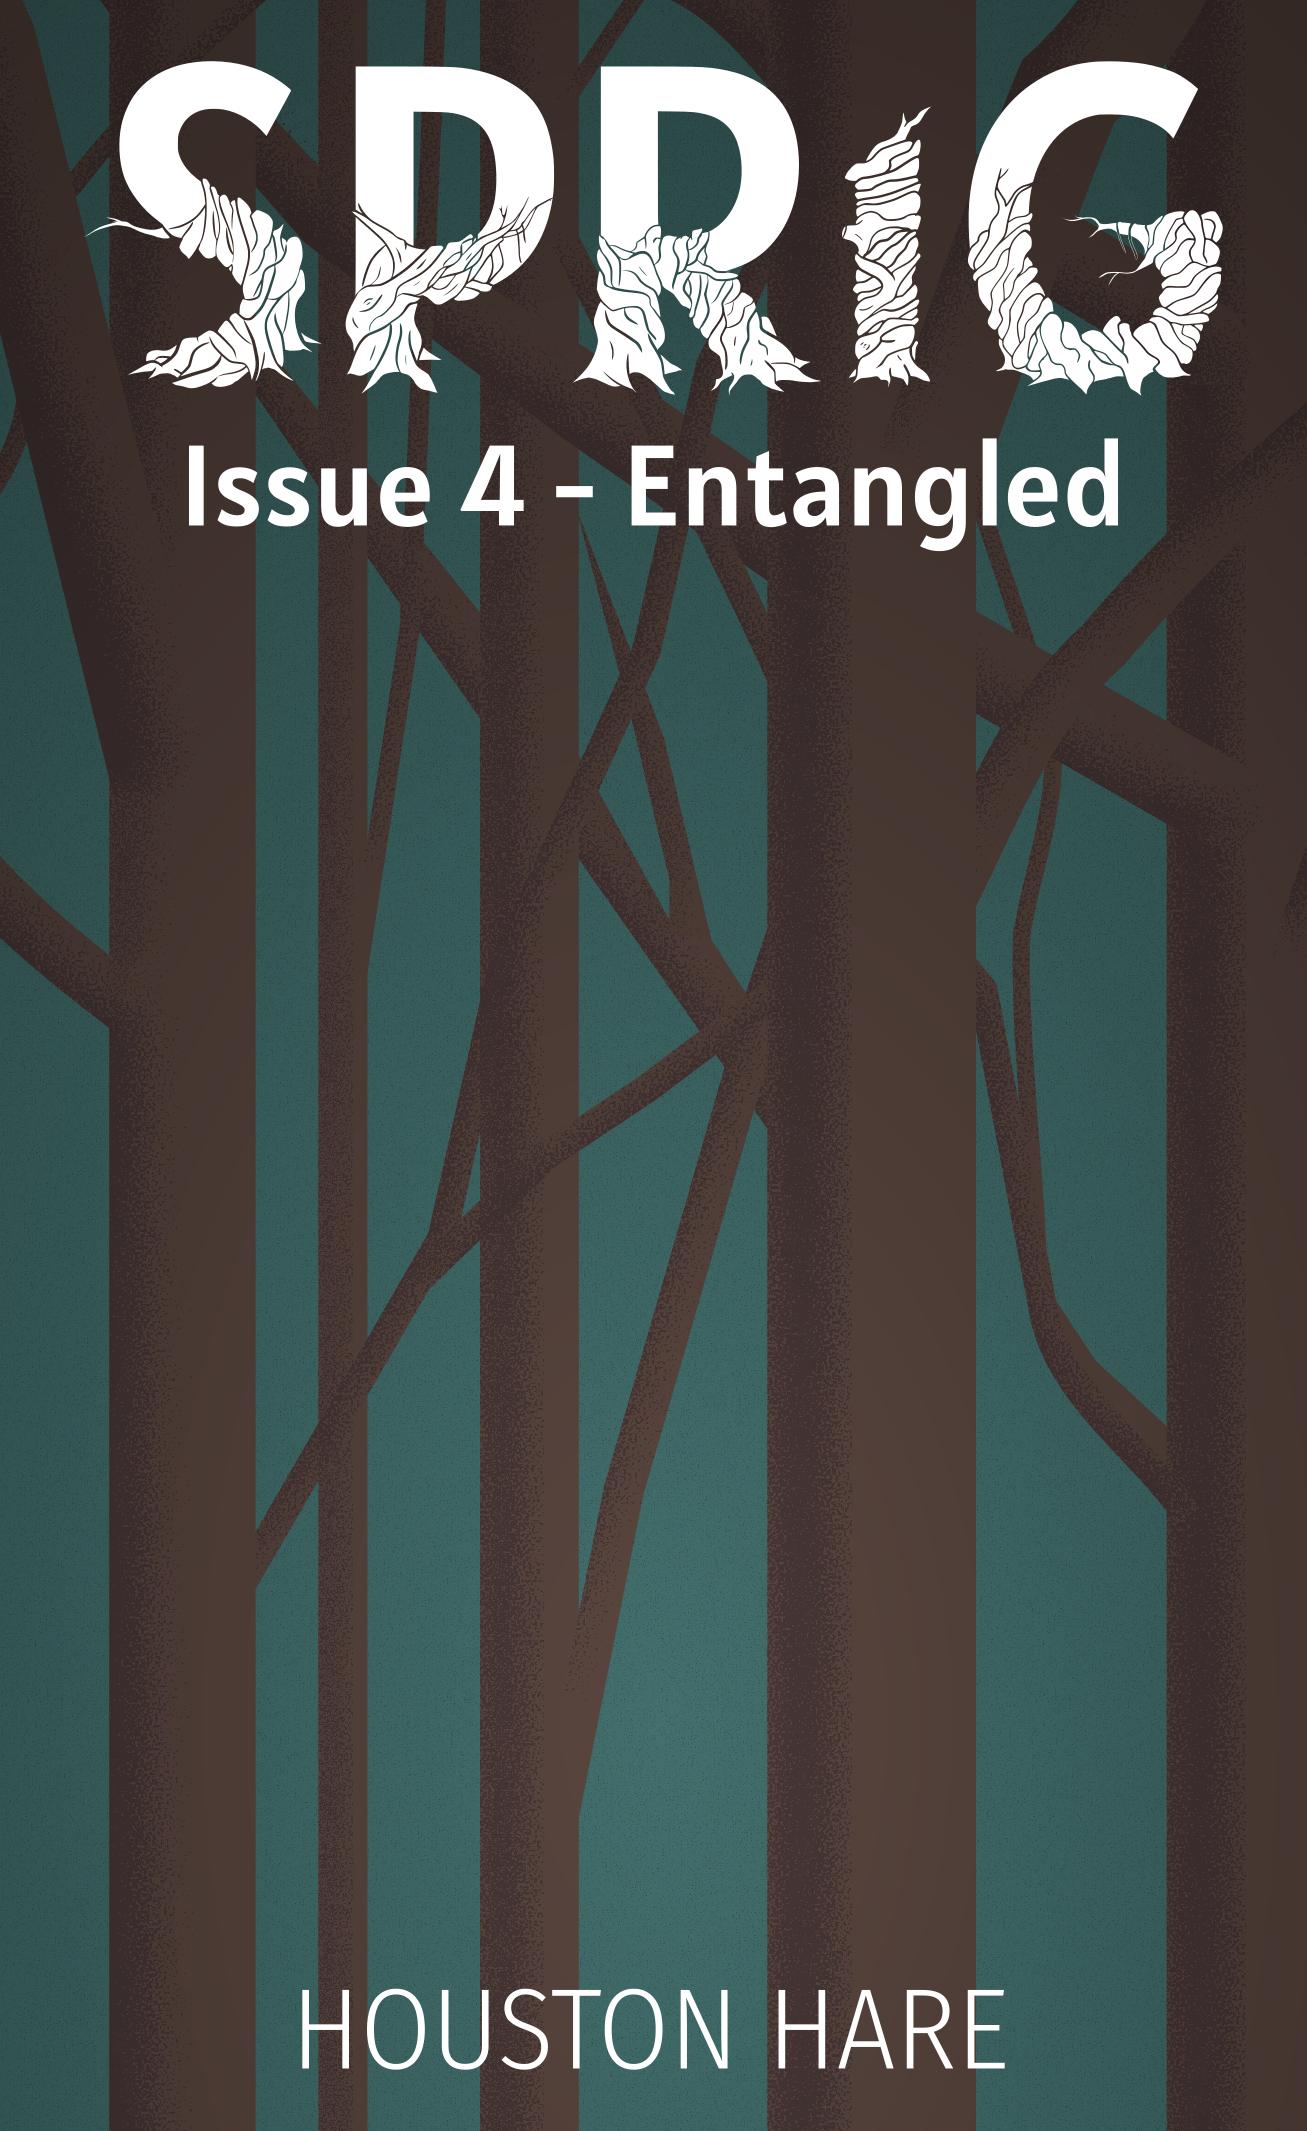 Sprig (Issue 4 - Entangled) Release & Rebranding